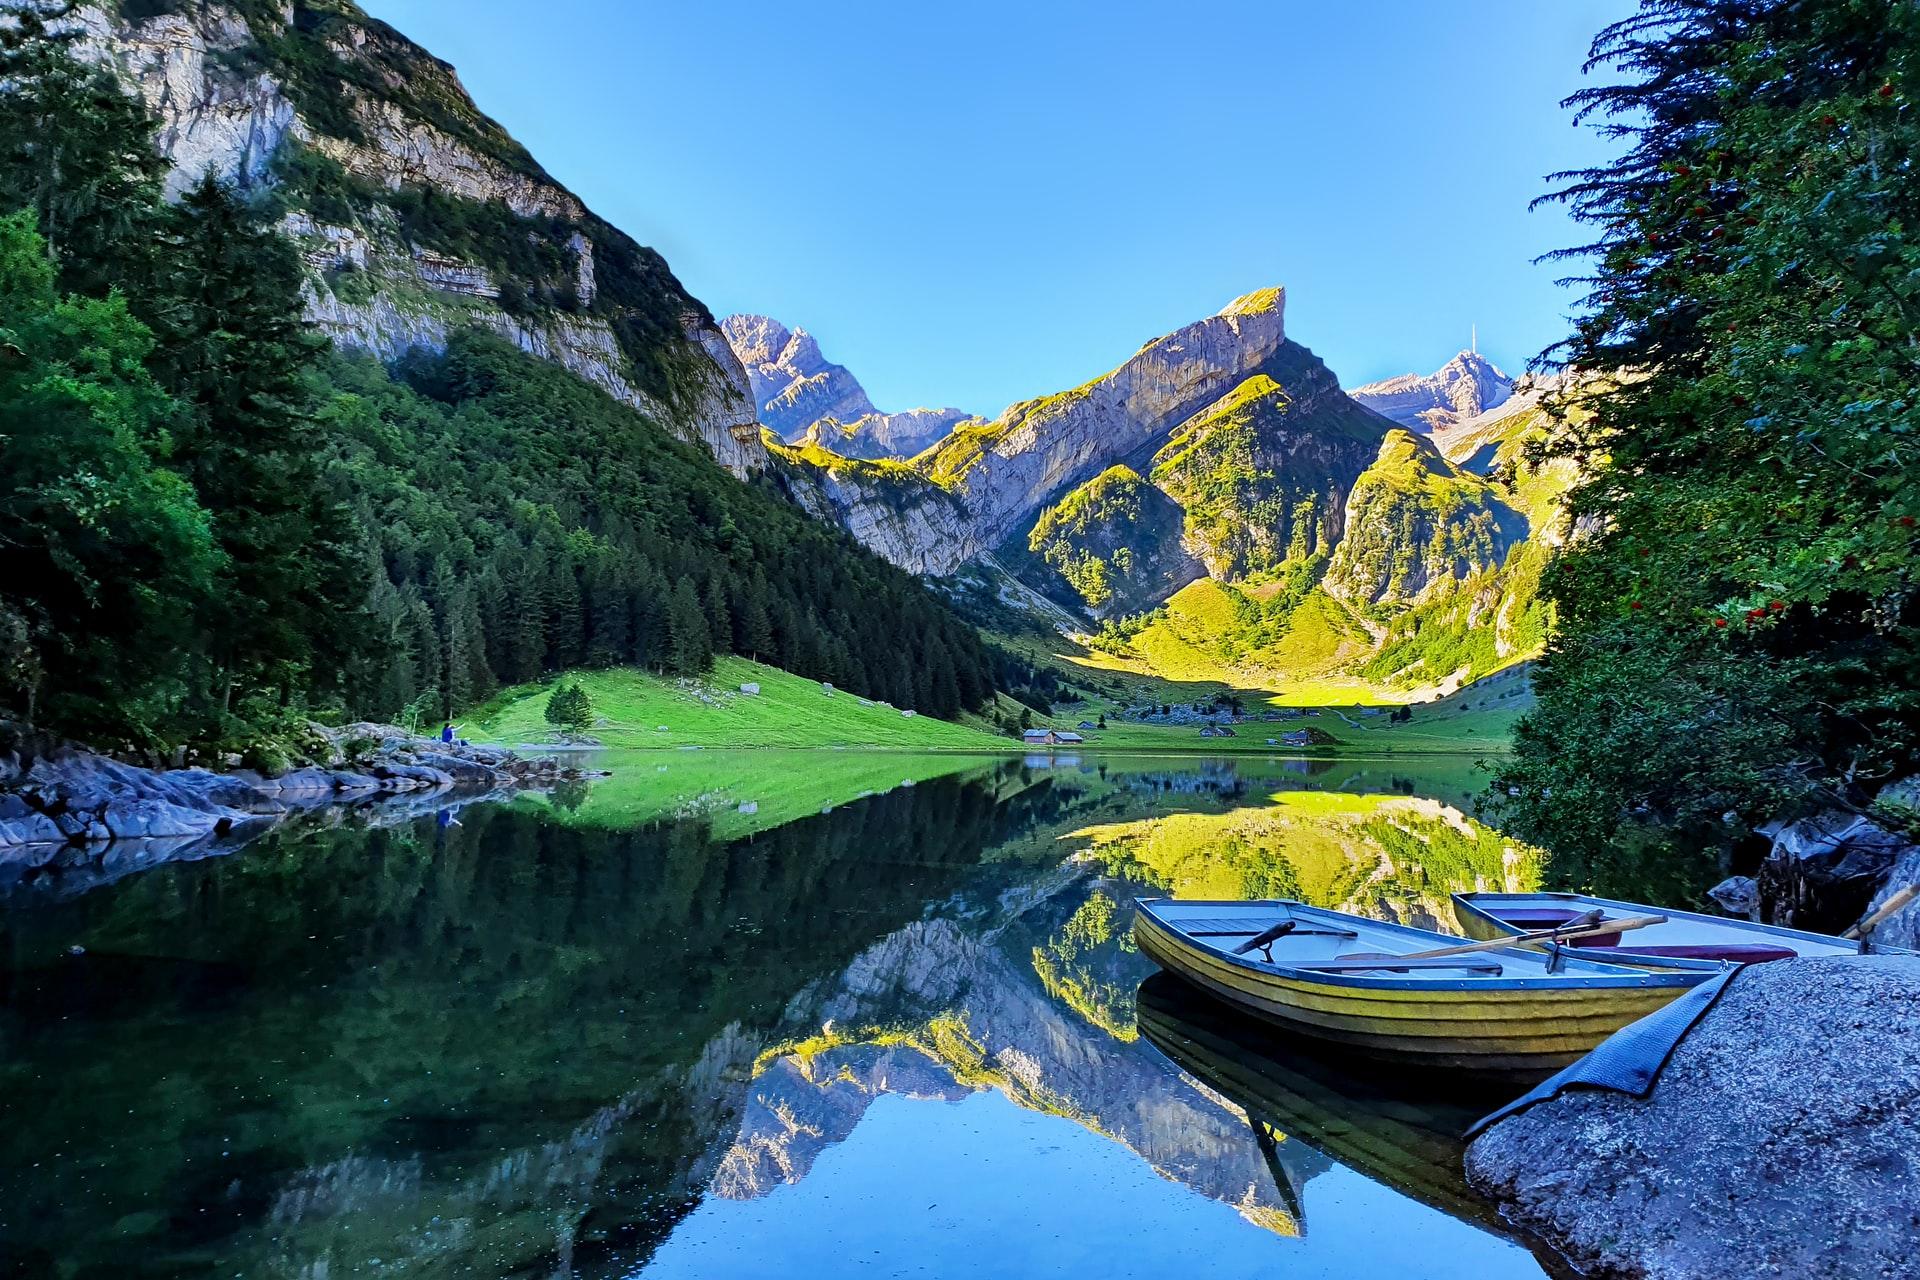 KDFB Spiritueller Impuls - Bergsee mit 2 Booten